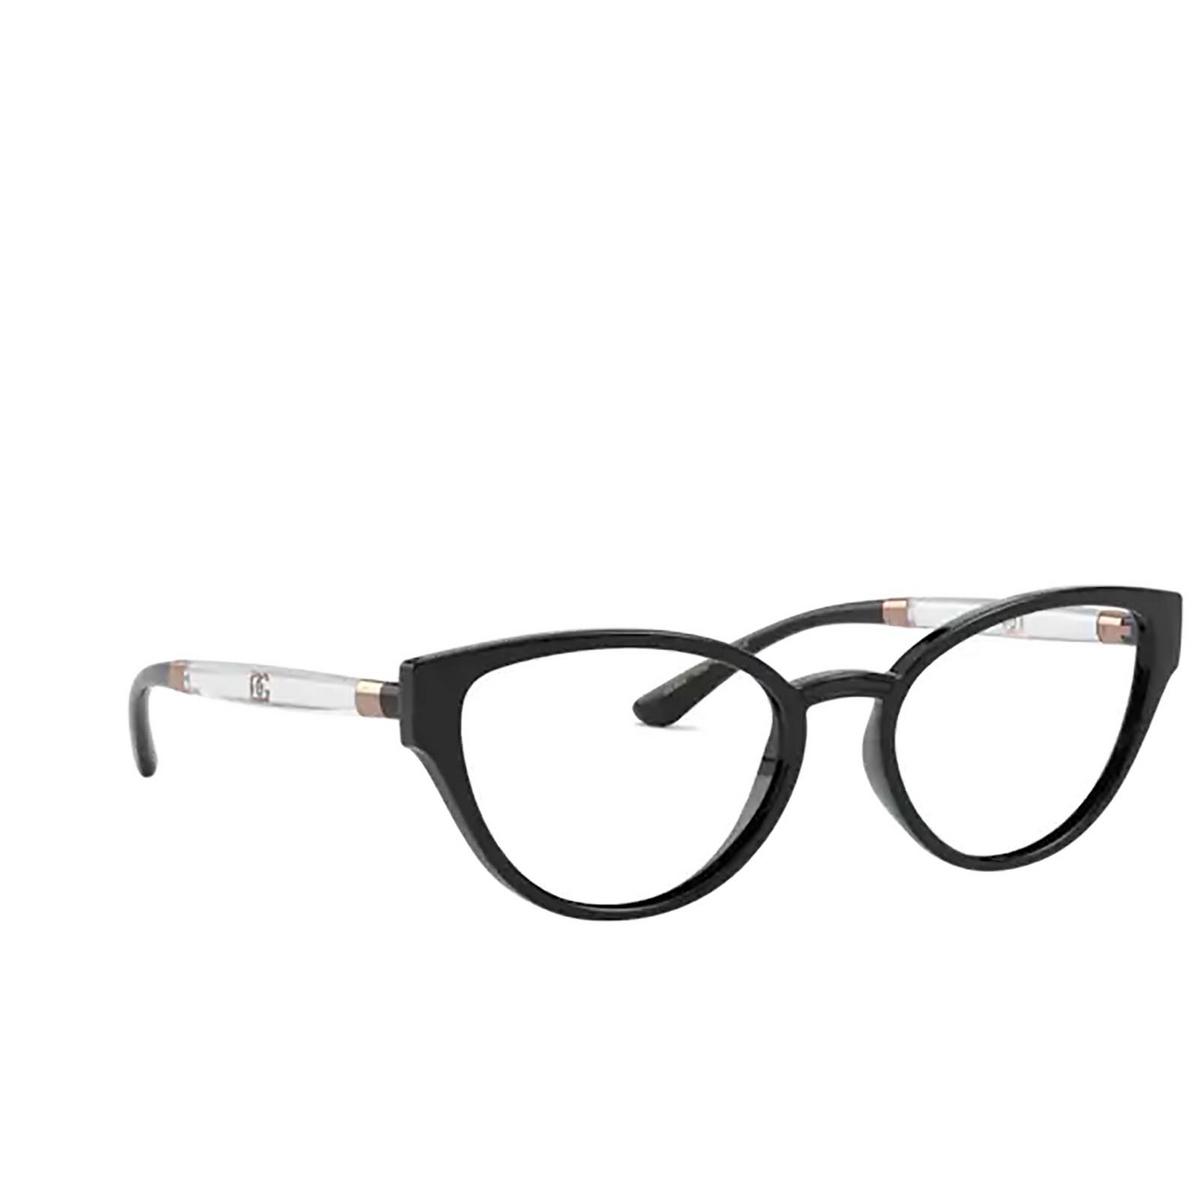 Dolce & Gabbana® Cat-eye Eyeglasses: DG5055 color Black 5012 - three-quarters view.